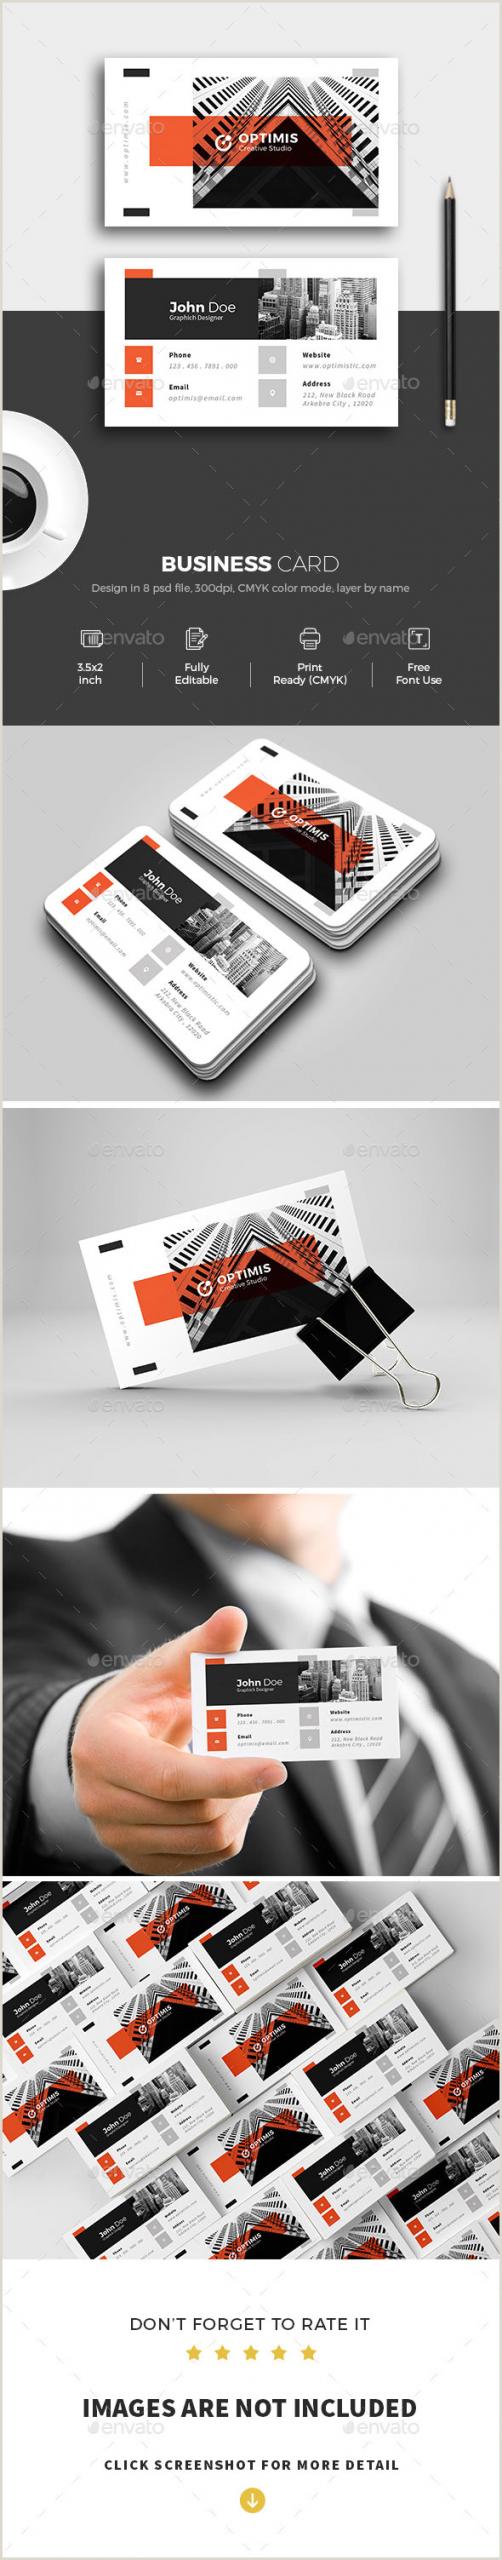 Buisness Card Graphics Minimal Business Card Graphics Designs & Templates